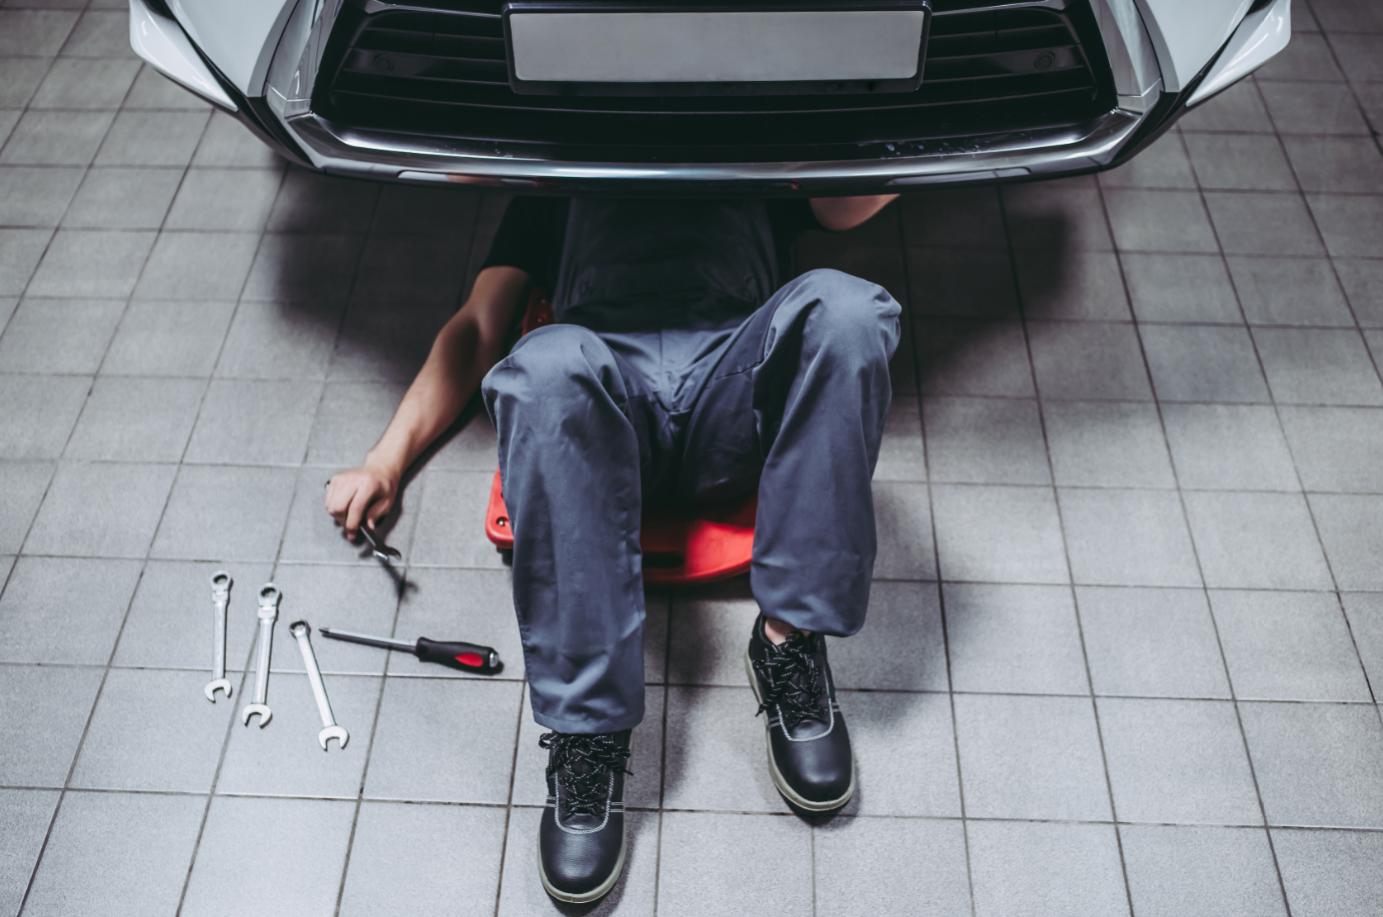 Best Auto Repair Labor Guides for Accurate Estimates